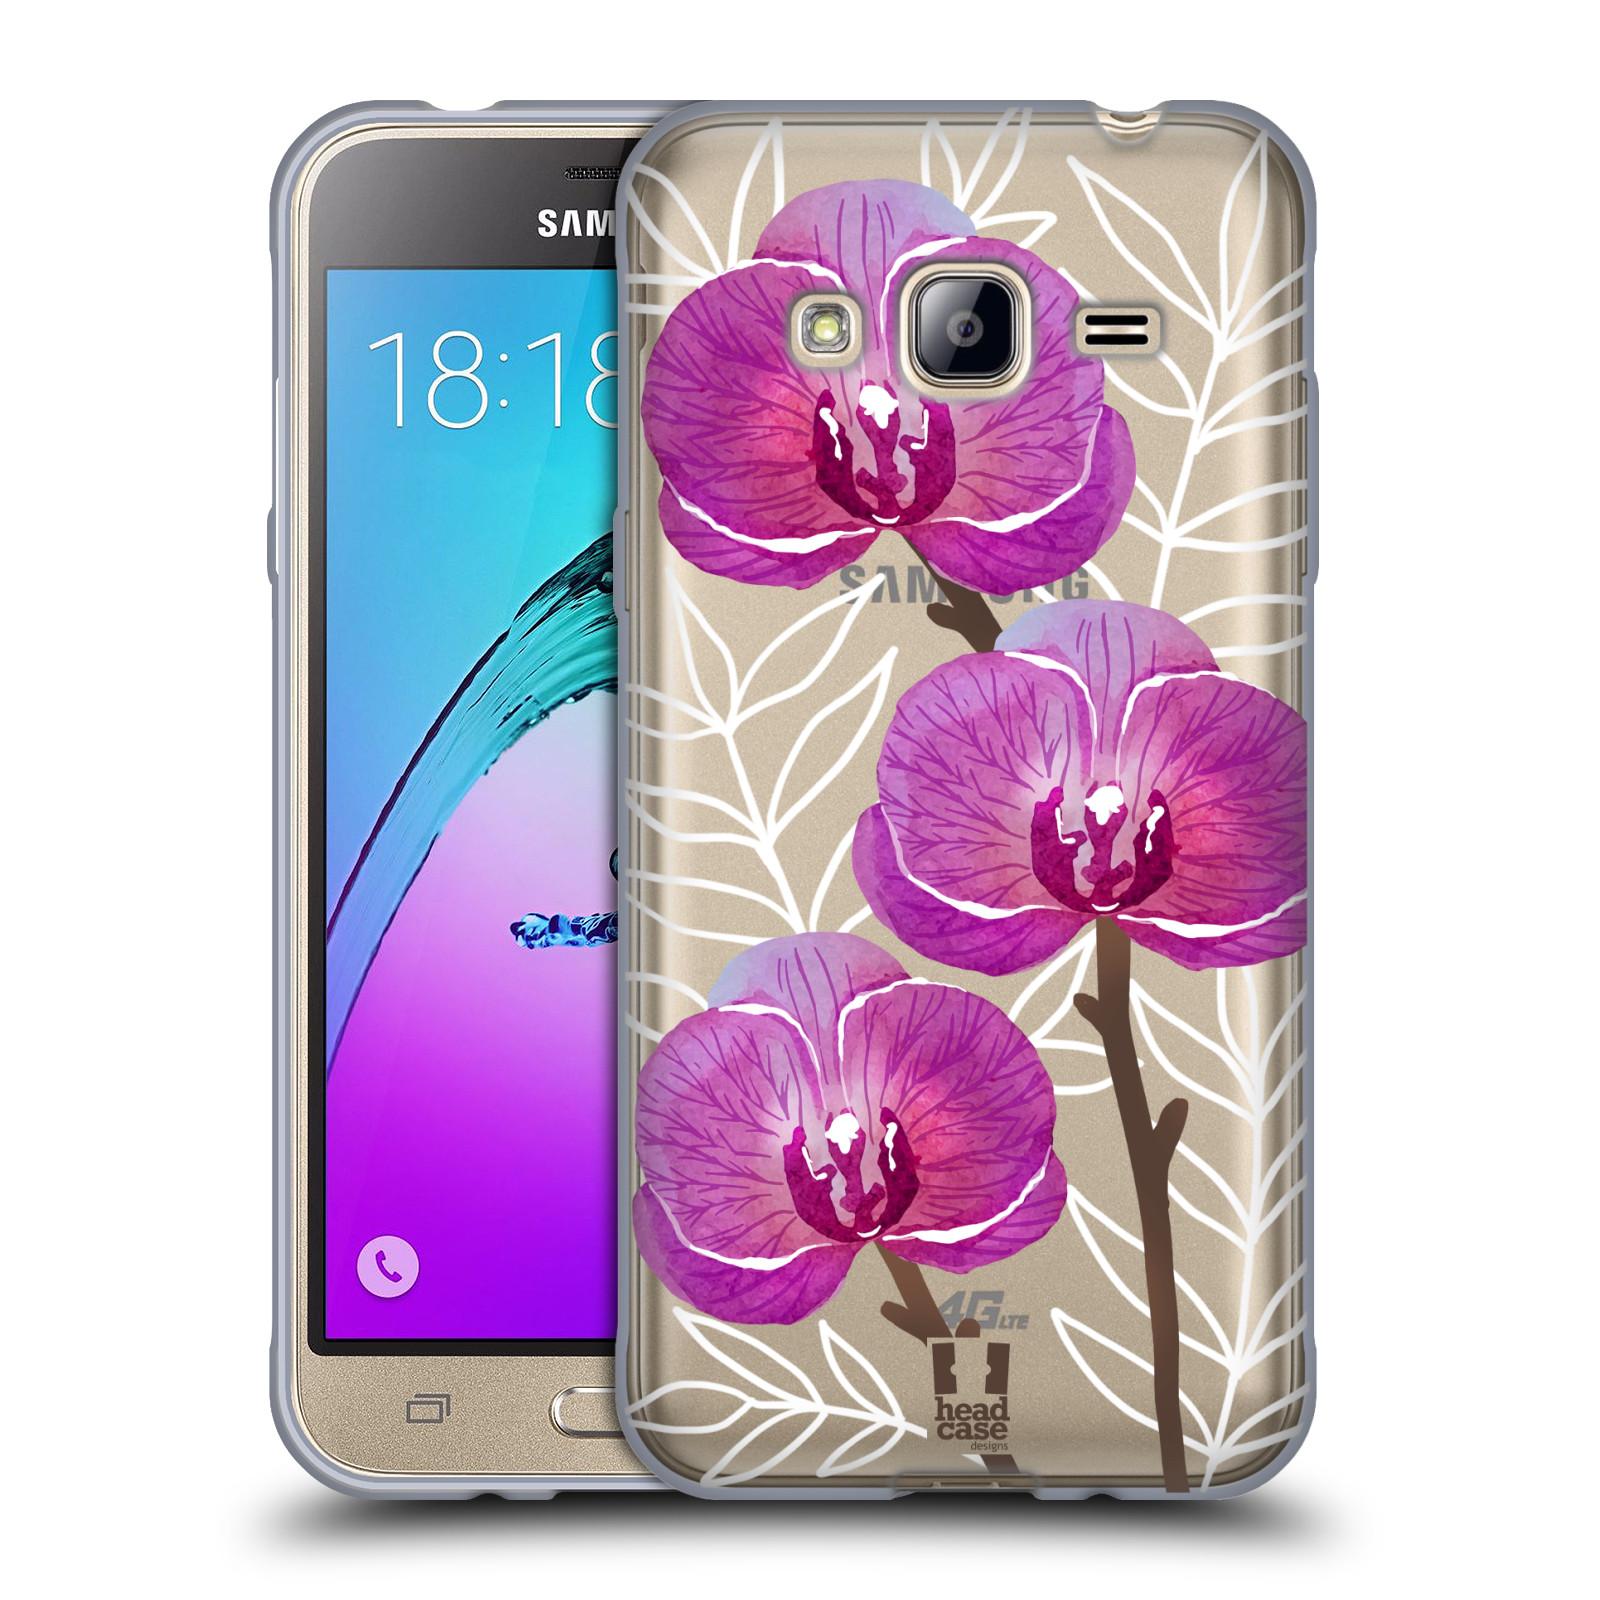 Silikonové pouzdro na mobil Samsung Galaxy J3 (2016) - Head Case - Hezoučké kvítky - průhledné